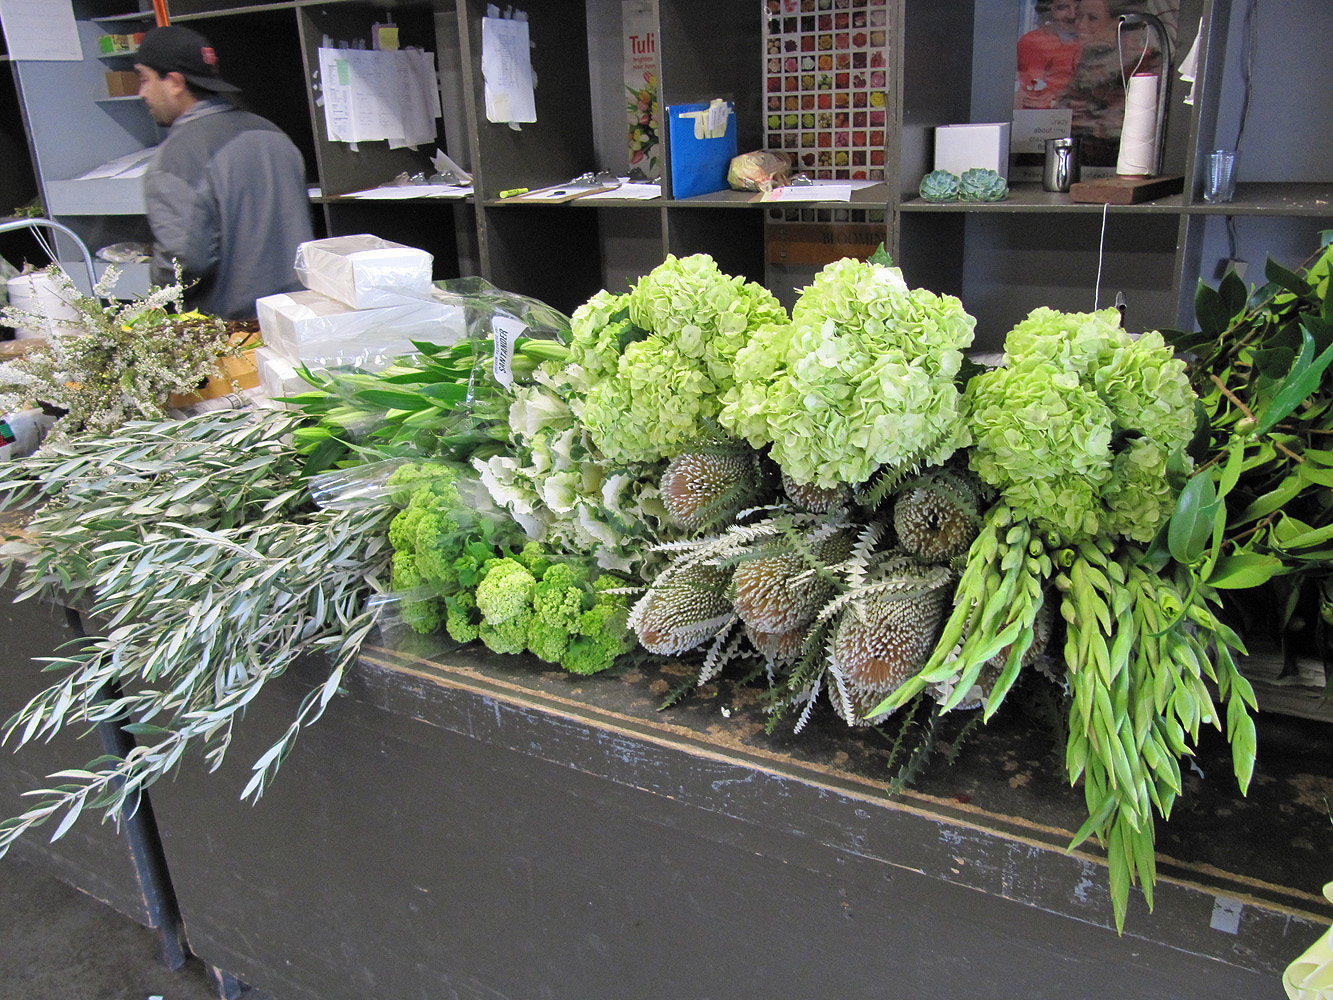 Sf flower mart in san francisco ca san franciscos wholesale flower market sffm izmirmasajfo Image collections